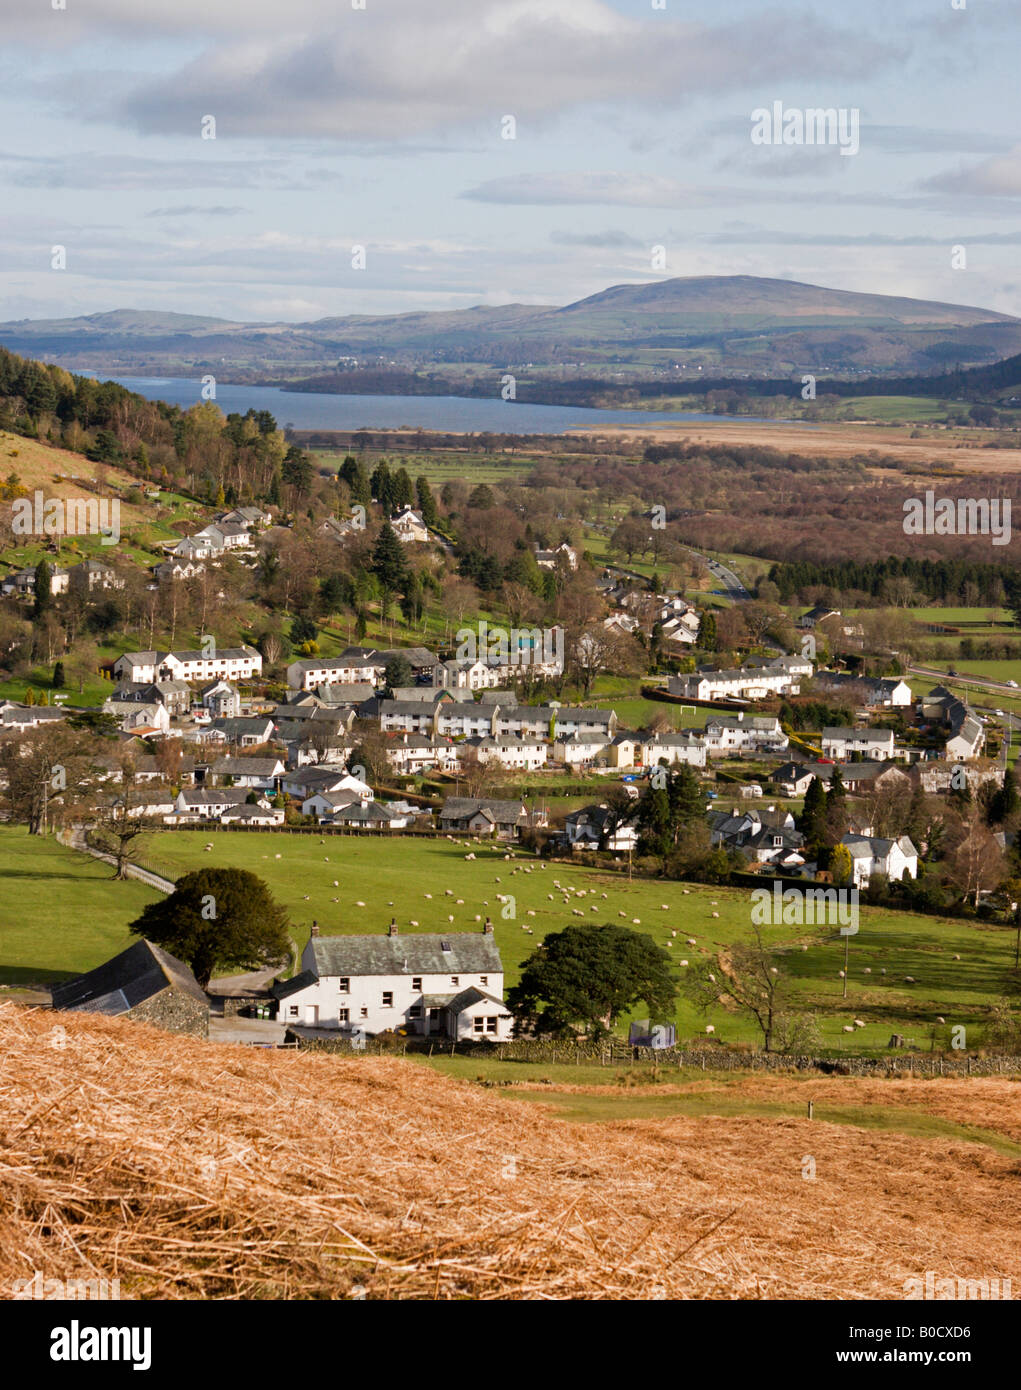 View over the village of Braithwaite and distant Bassenthwaite Lake seen from the fell above Little Braithwaite, - Stock Image